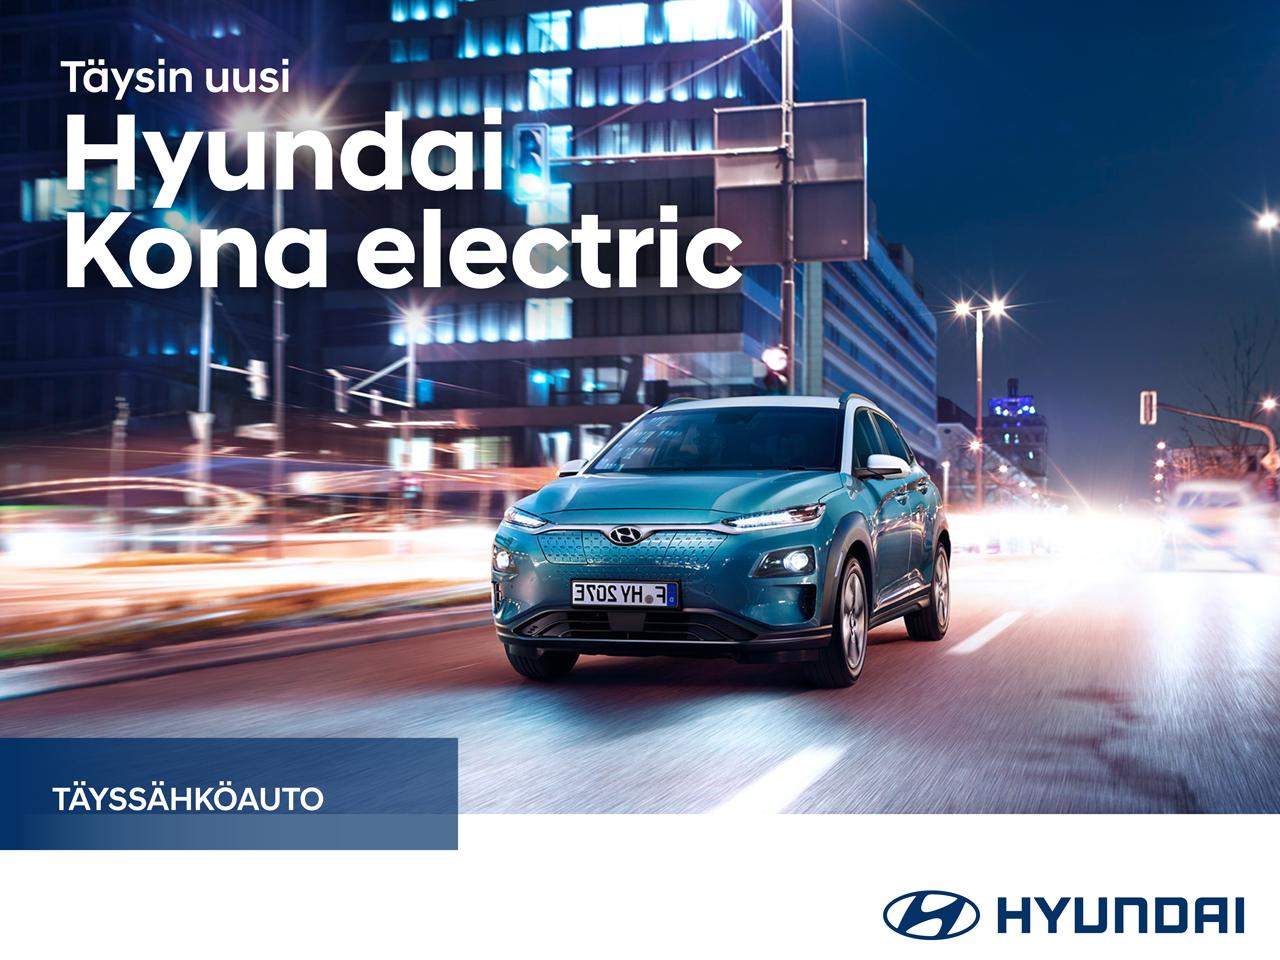 Odotettu uutuus Hyundai Kona electric